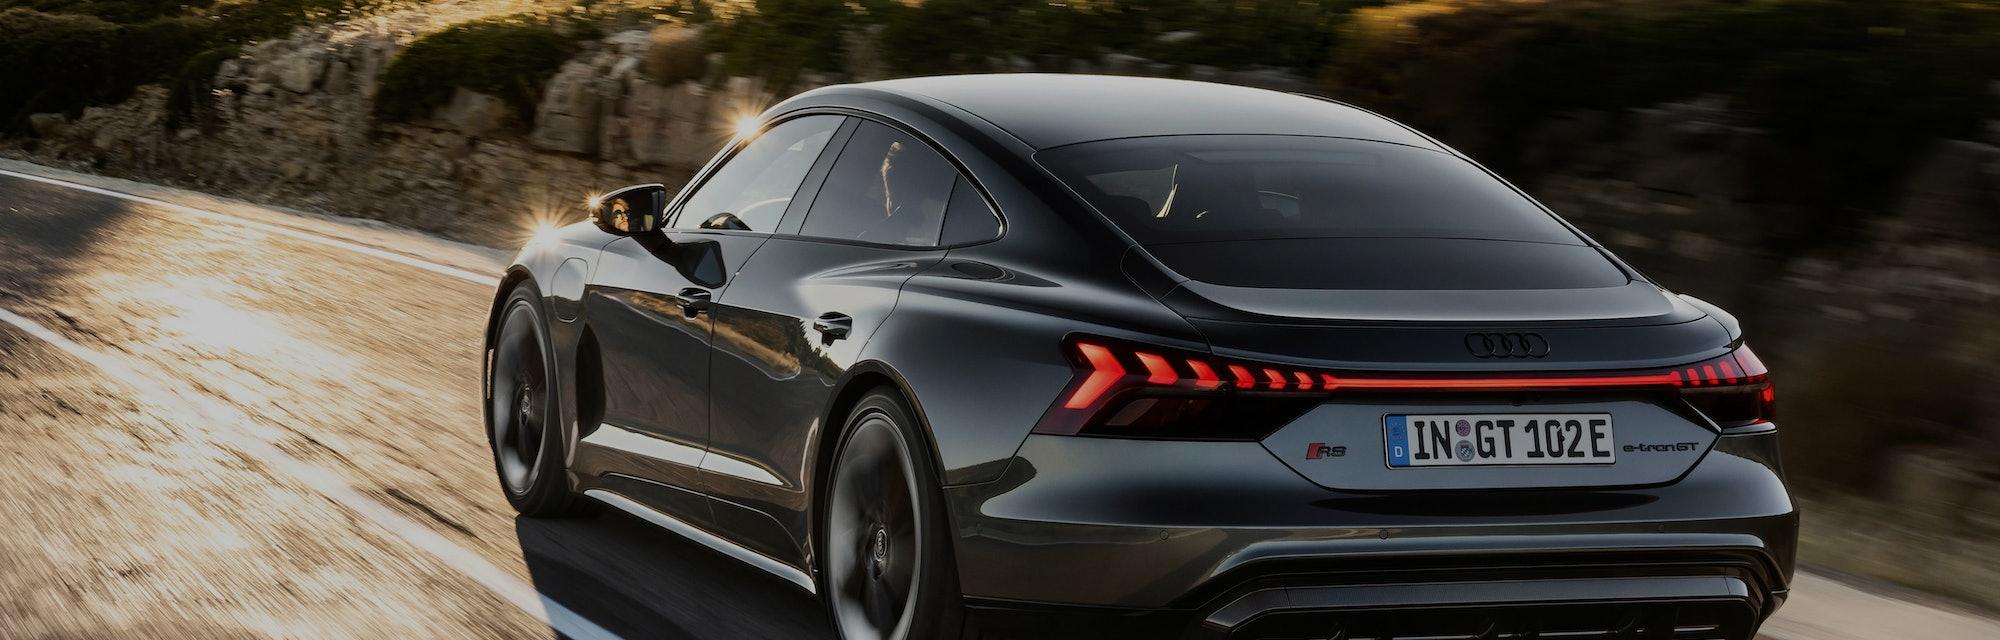 Audi has begun sales of its e-tron GT, a luxury electric car.